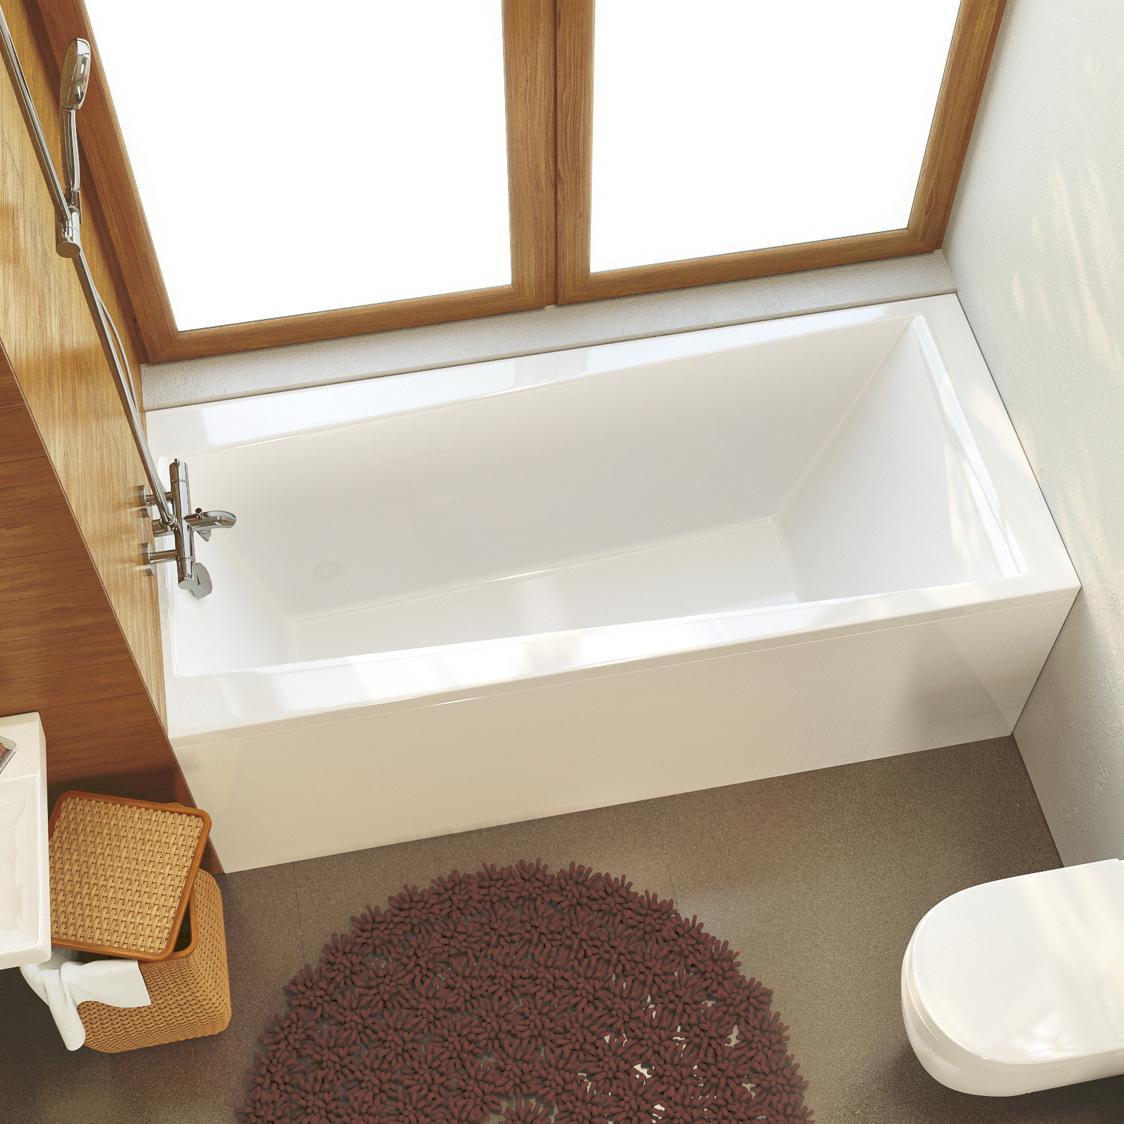 Акриловая ванна Alpen Flora 170x75 без гидромассажа акриловая ванна alpen mars 170x75 комплект